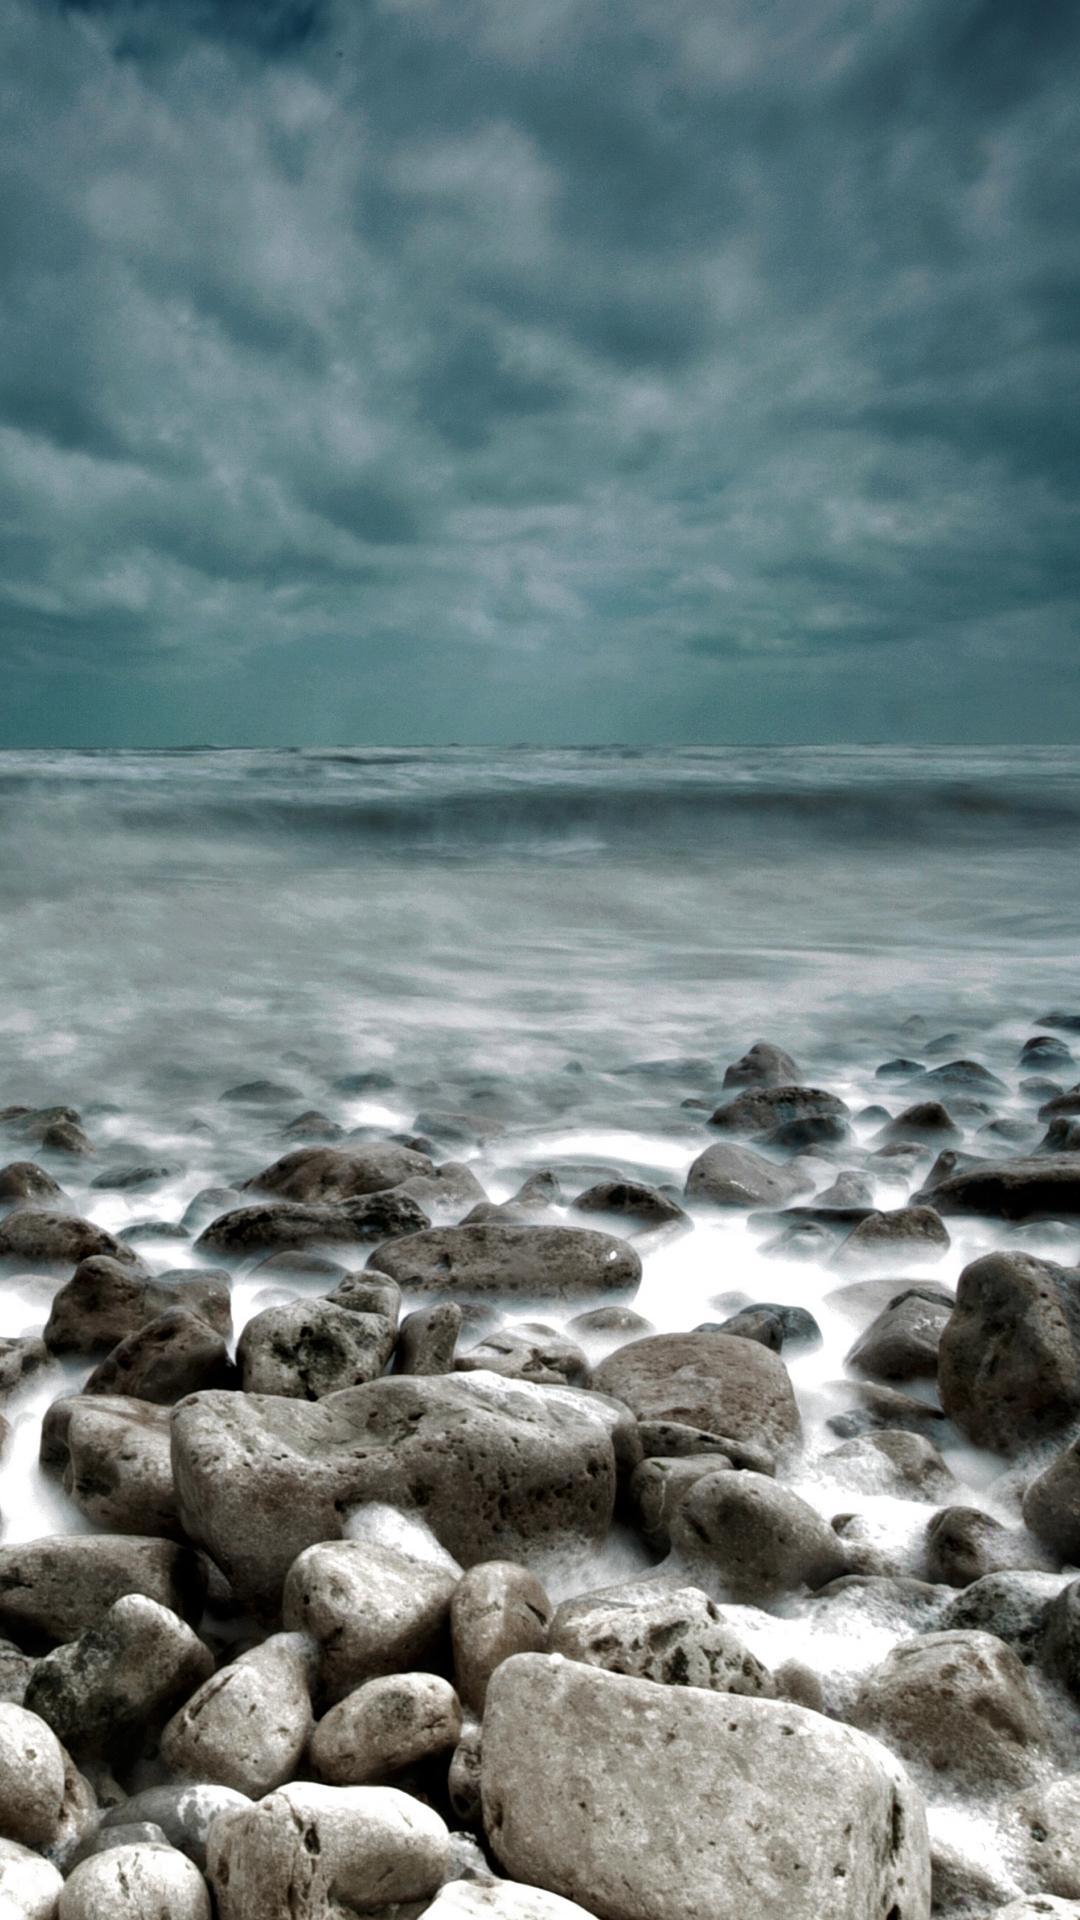 Stormy Sea htc one wallpaper